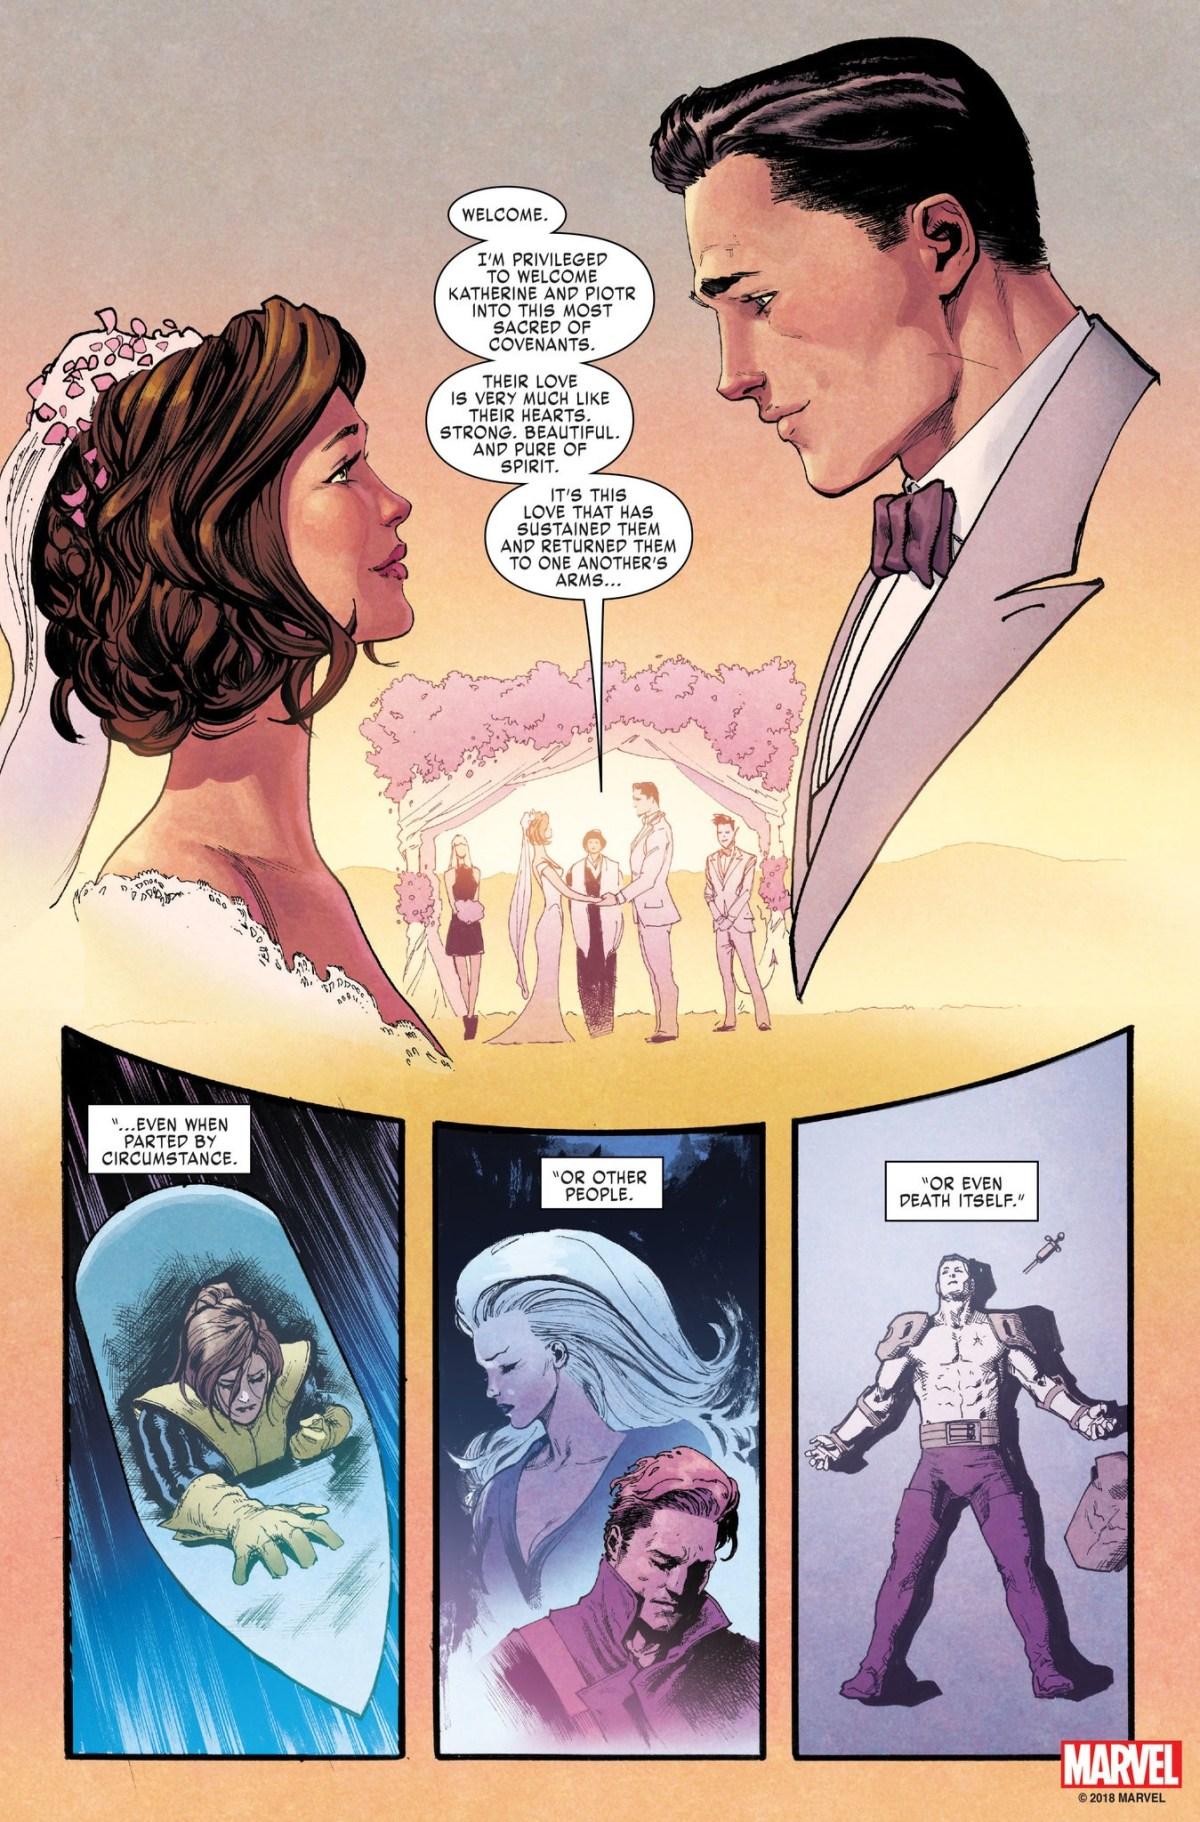 O casamento de Kitty Pride e Colossus - X-Men Gold #30